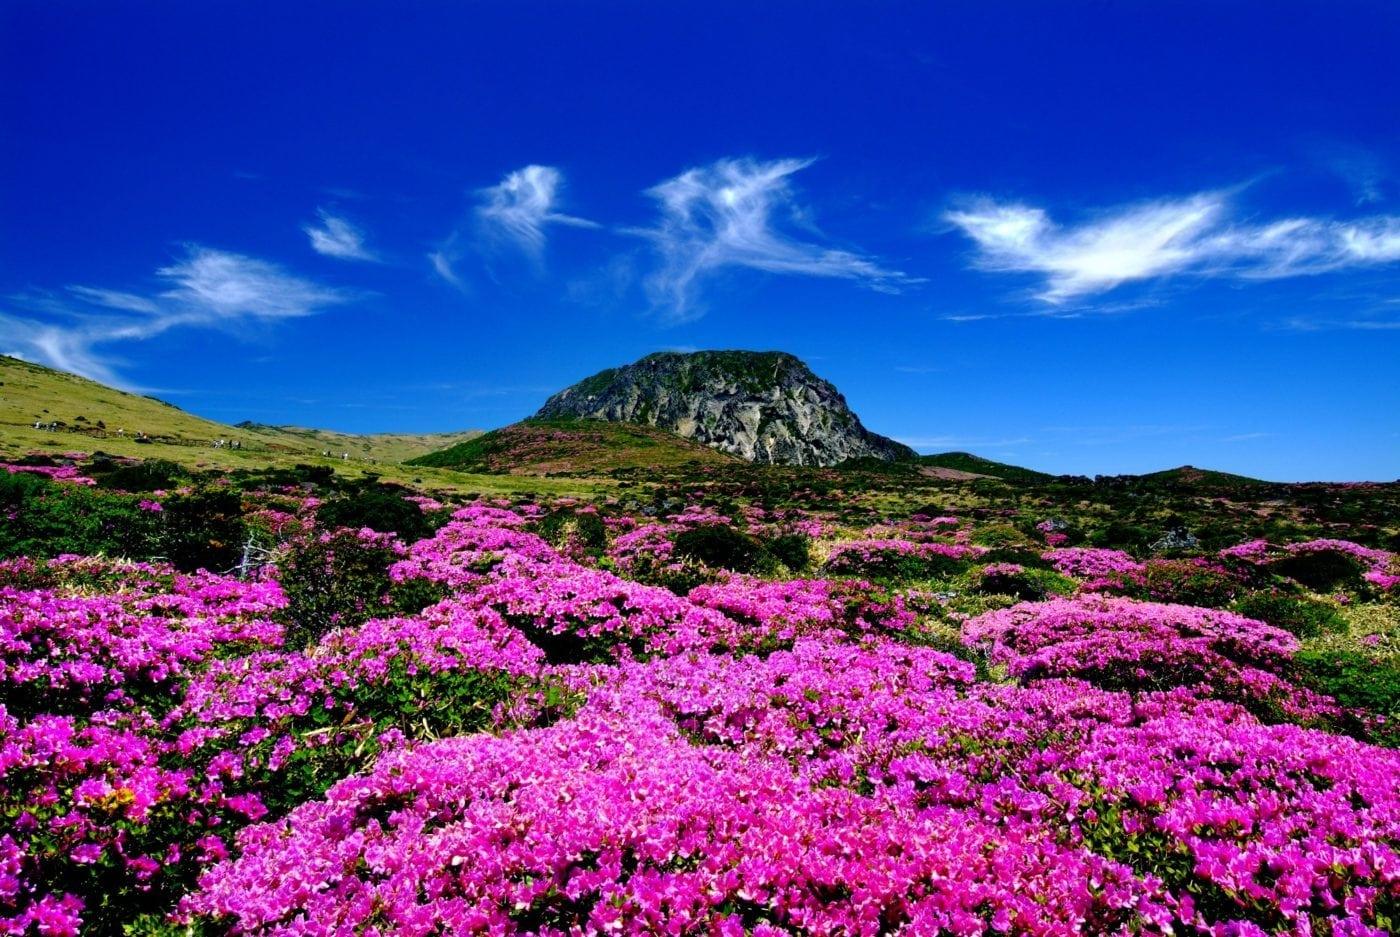 https://www.10mag.com/directory/entertainment/listing/hallasan-mountain-cheju-jeju-do